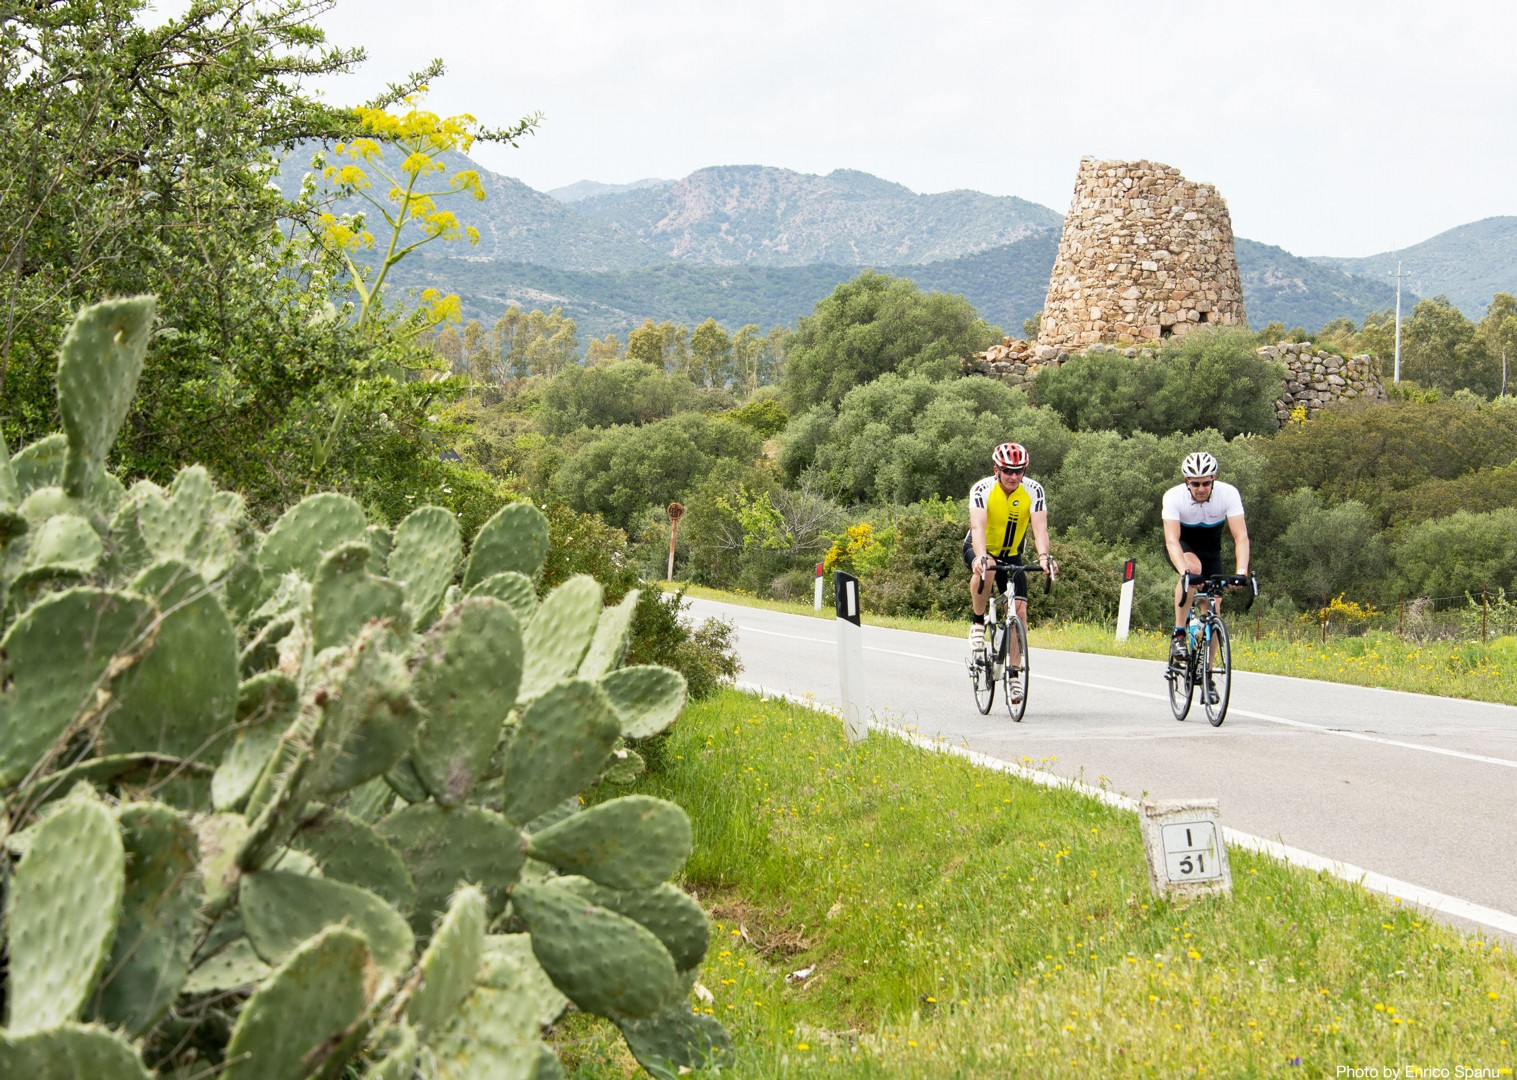 Sardinian-Cycling-Holiday-Road-Sardinian-Mountains.jpg - Italy - Sardinia - Mountain Explorer - Guided Road Cycling Holiday - Italia Road Cycling